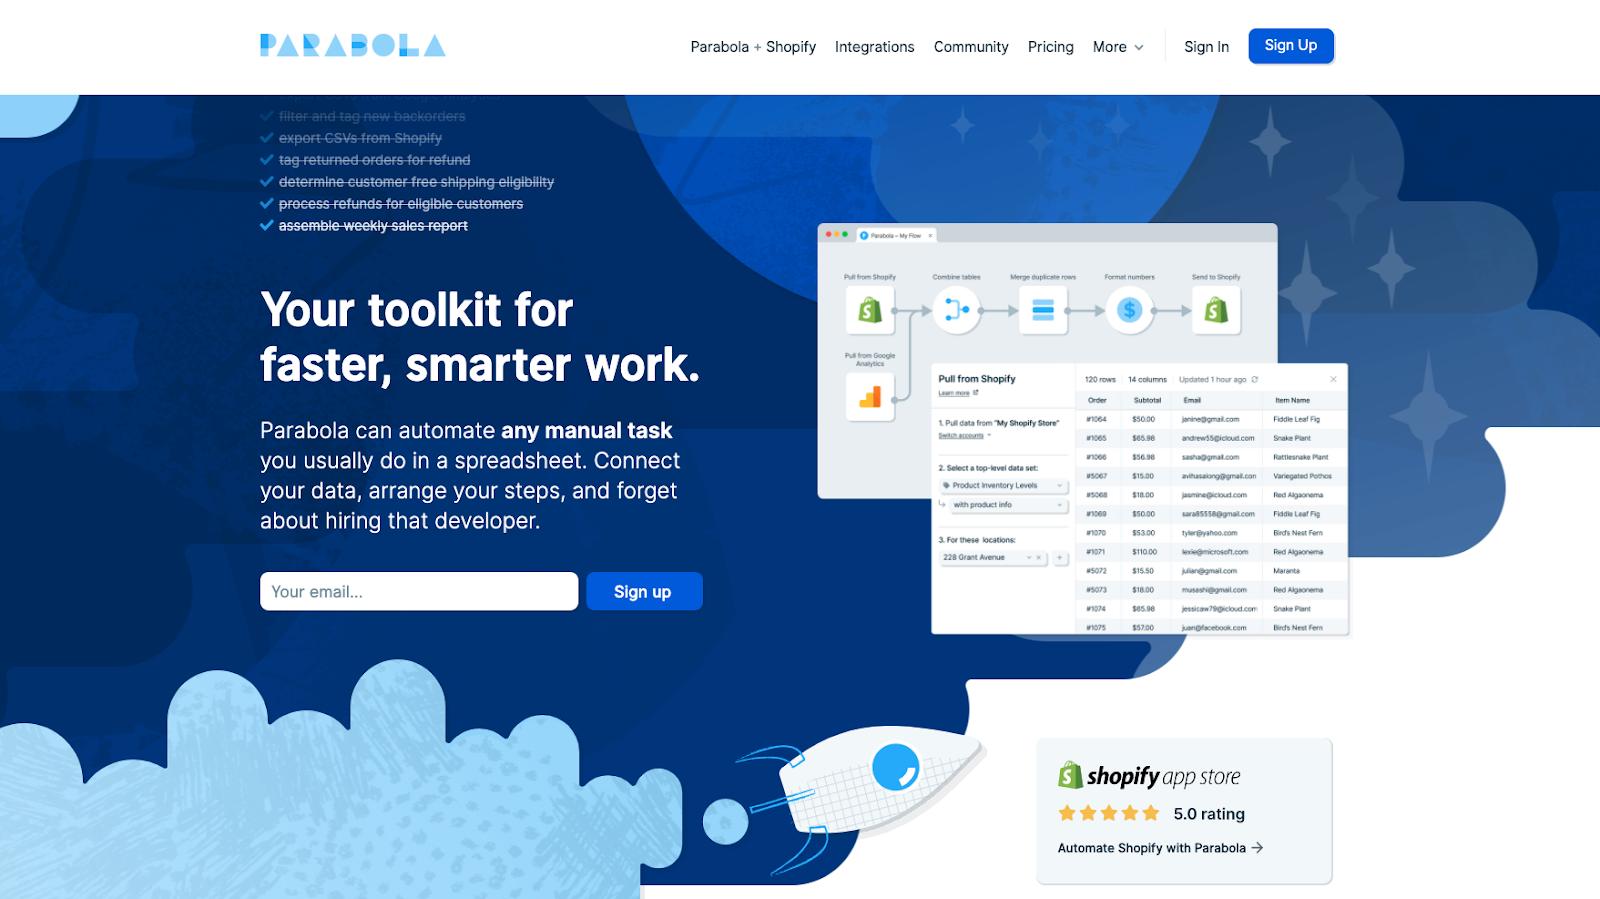 parabola homepage